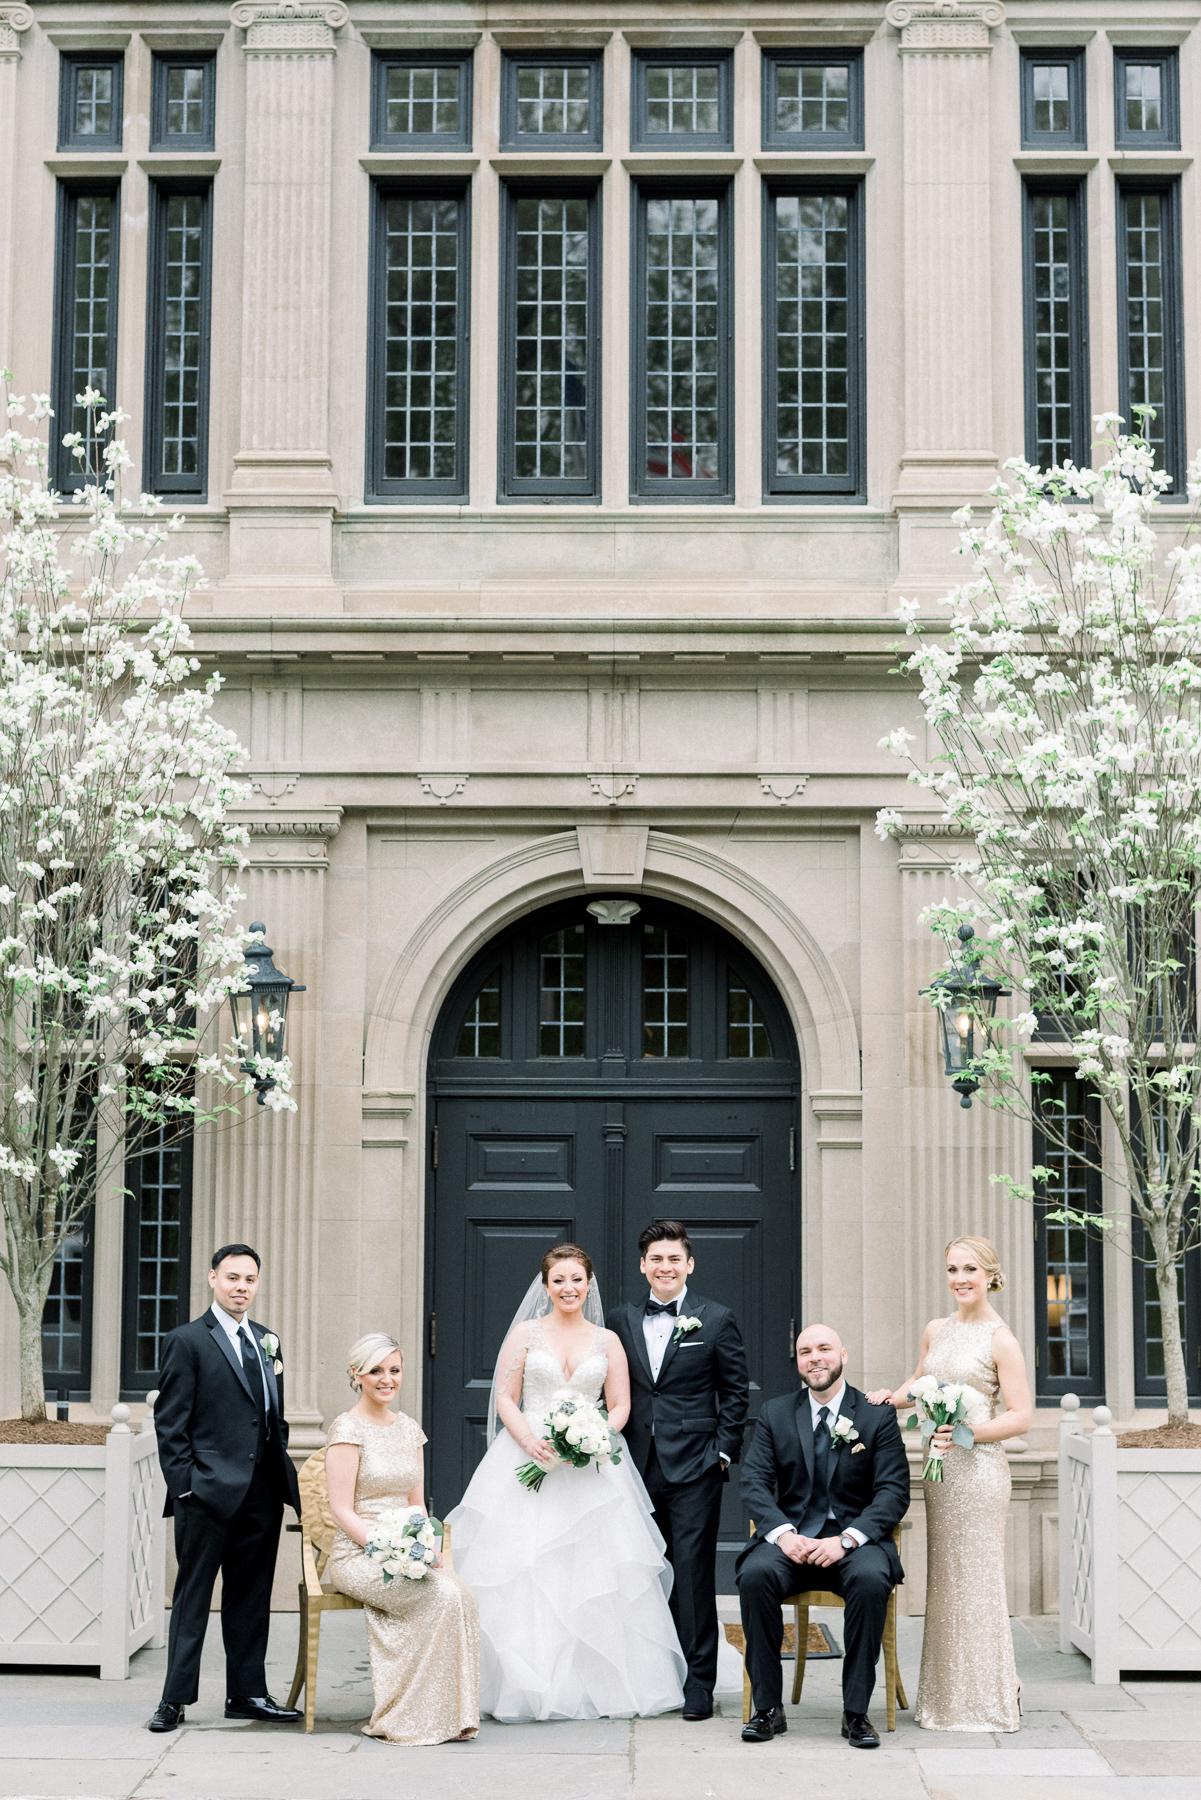 Vanity Fair Style Bridal Portrait at Natirar in Gladstone, NJ